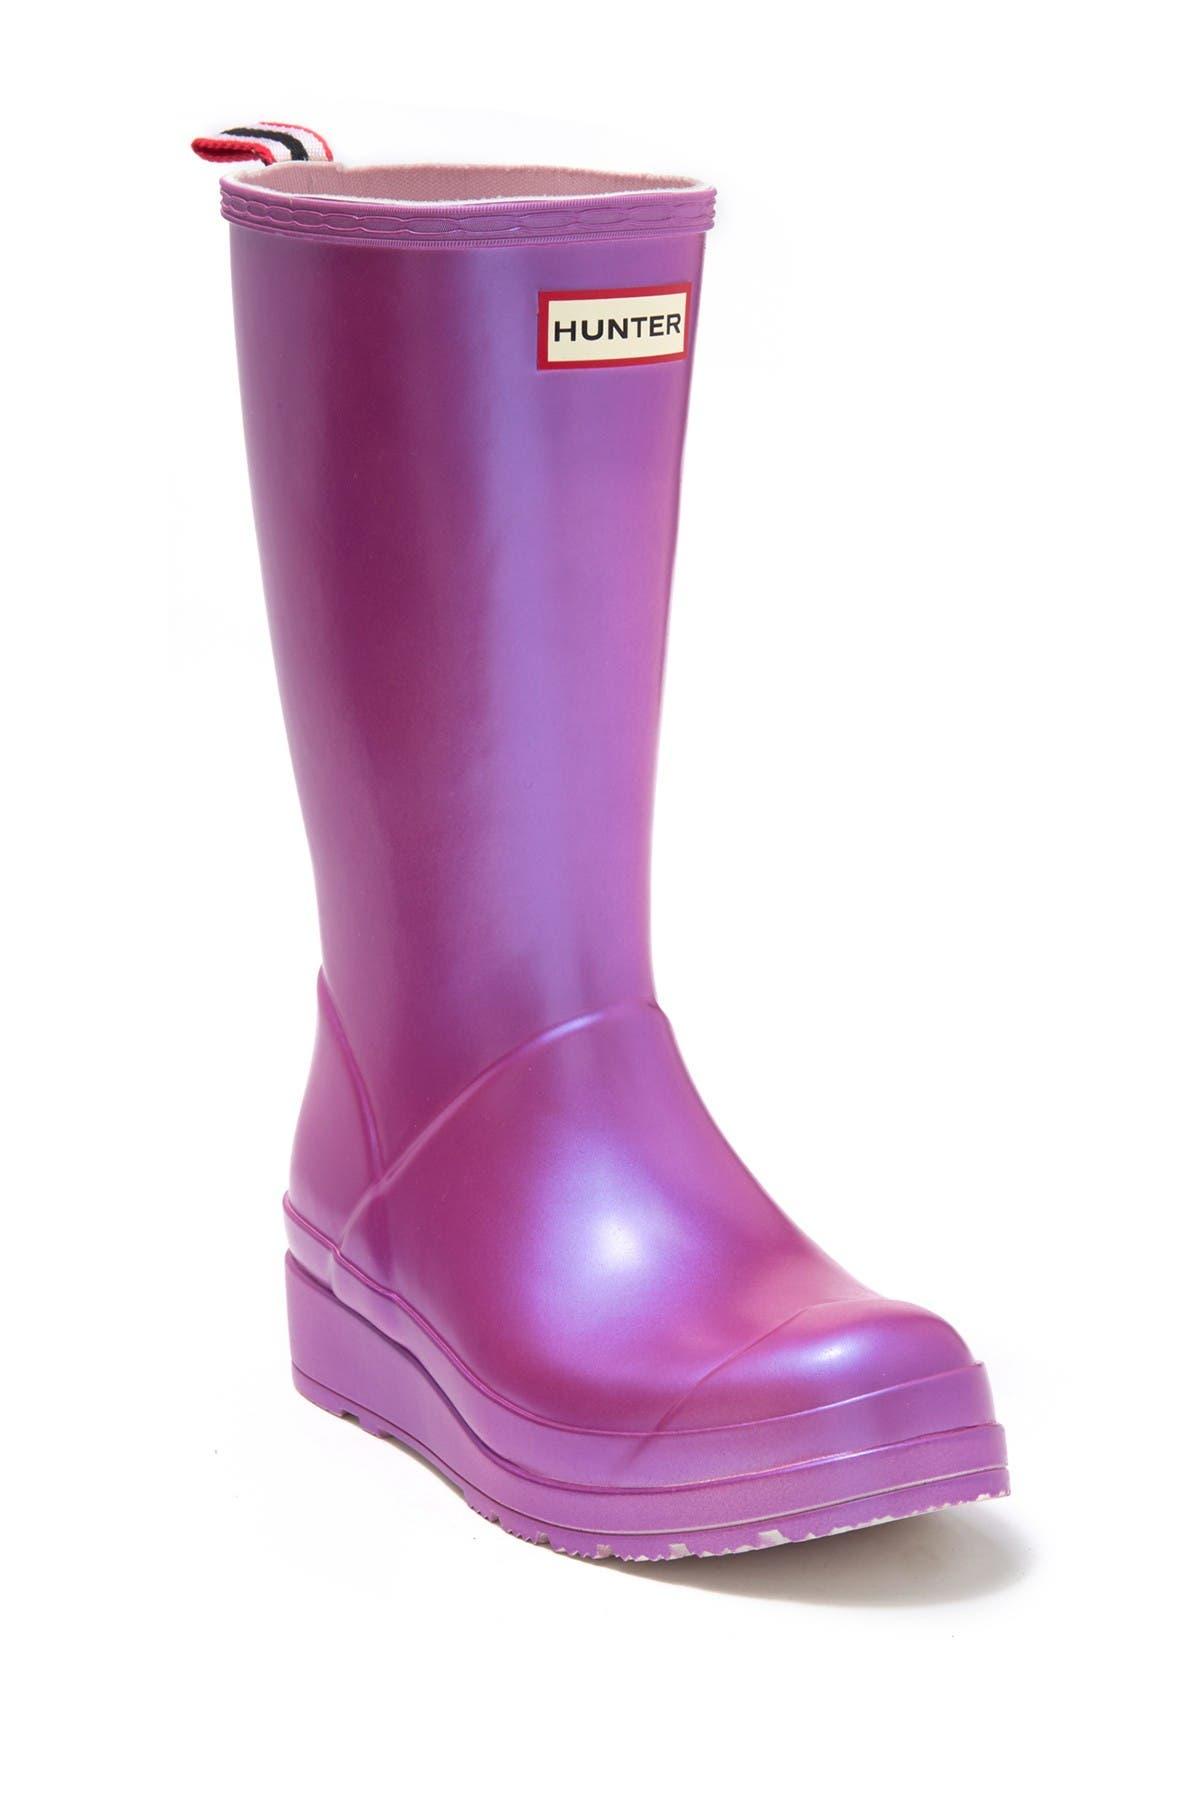 Image of Hunter Original Play Tall Nebula Rain Boot